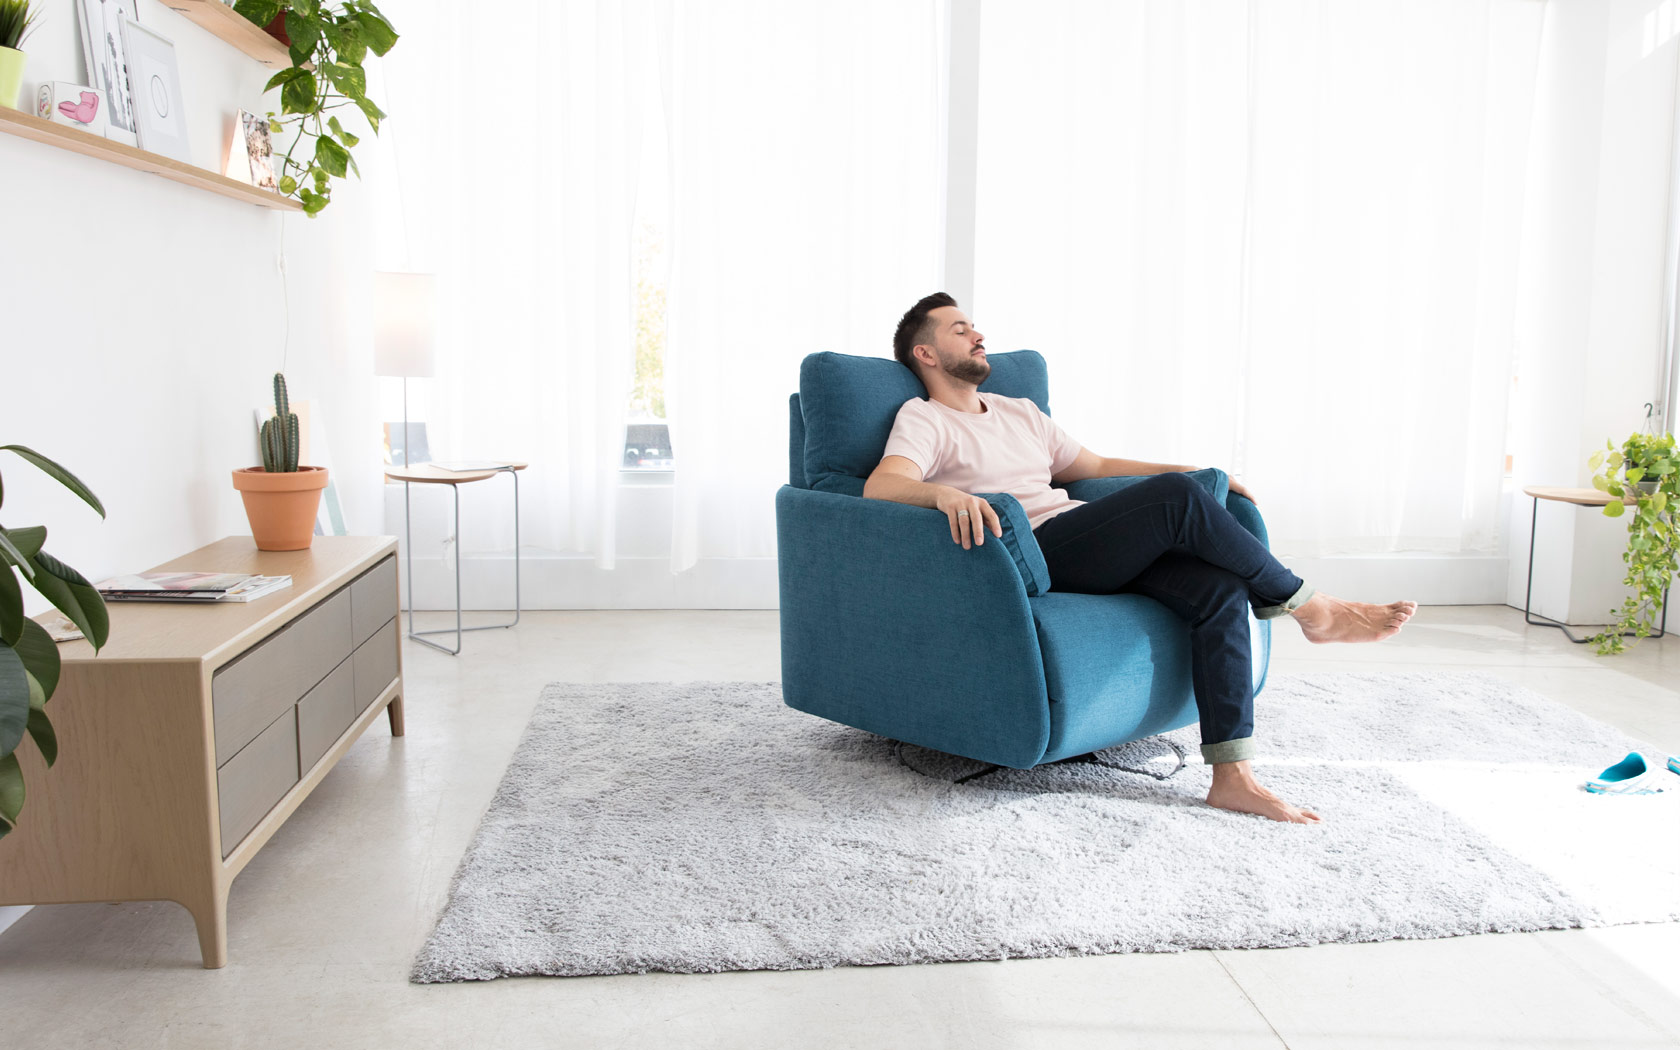 Adan sillon relax 2020 05